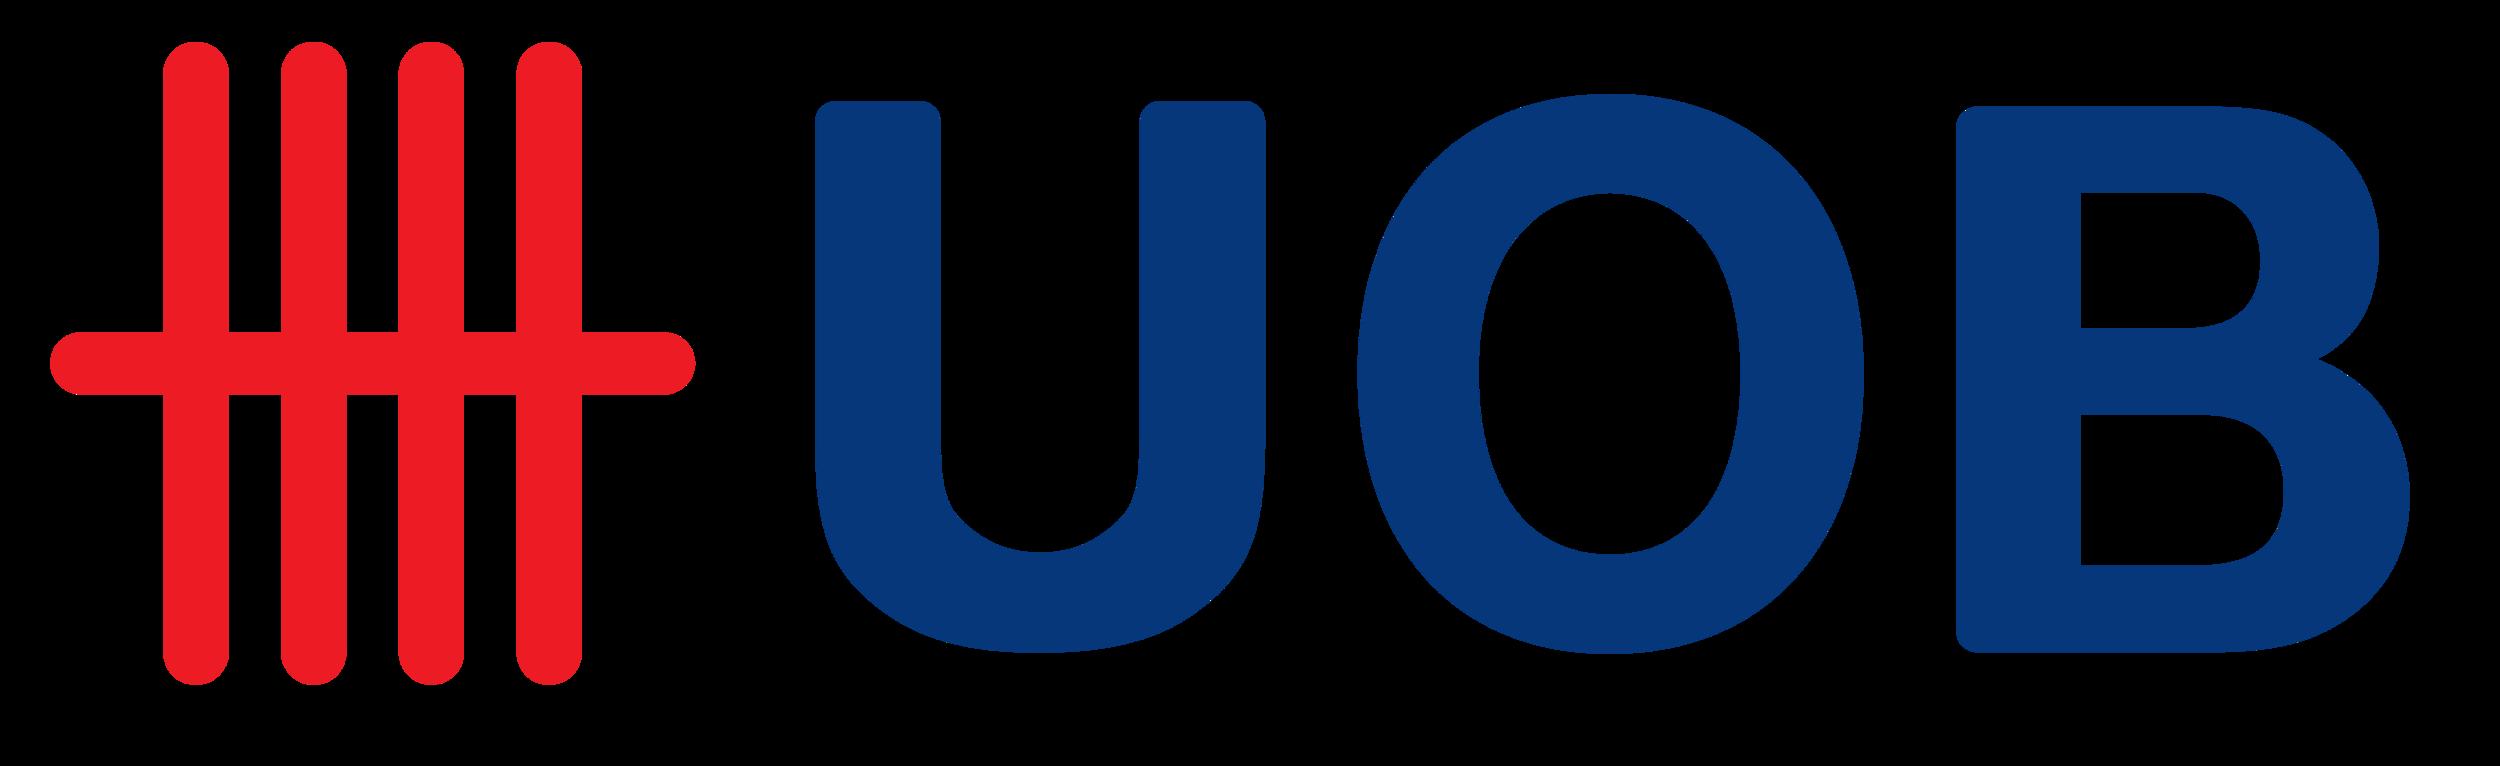 UOB Visa Signature Card | Photo Credit: UOB